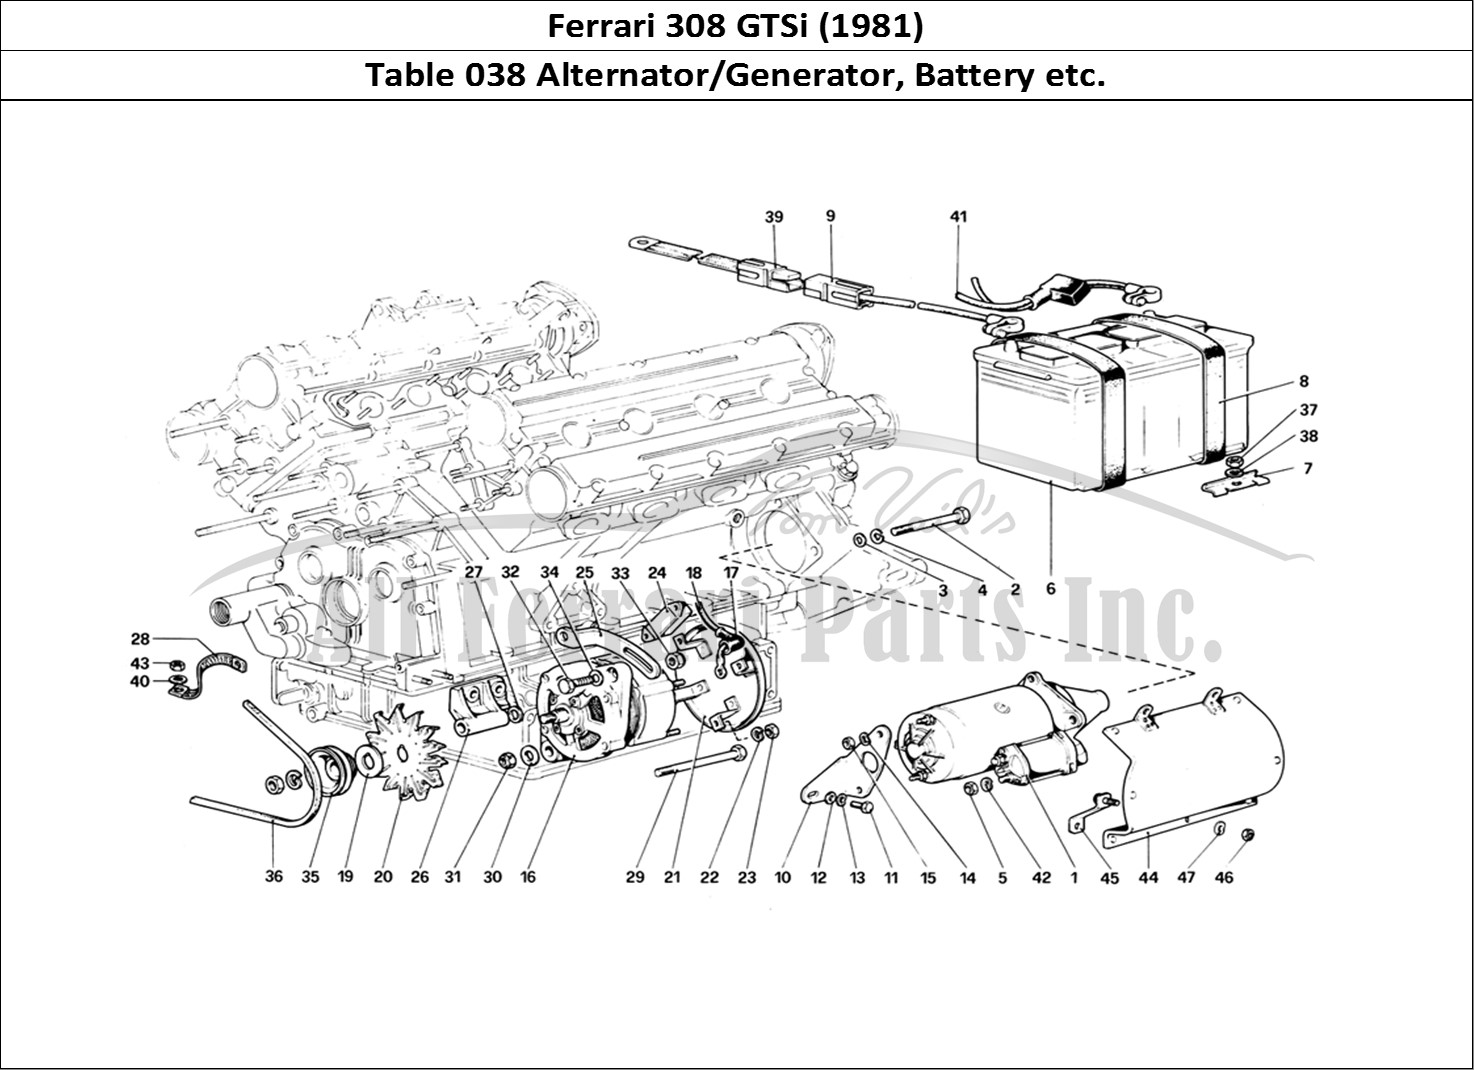 Buy original Ferrari 308 GTSi (1981) 038 Alternator